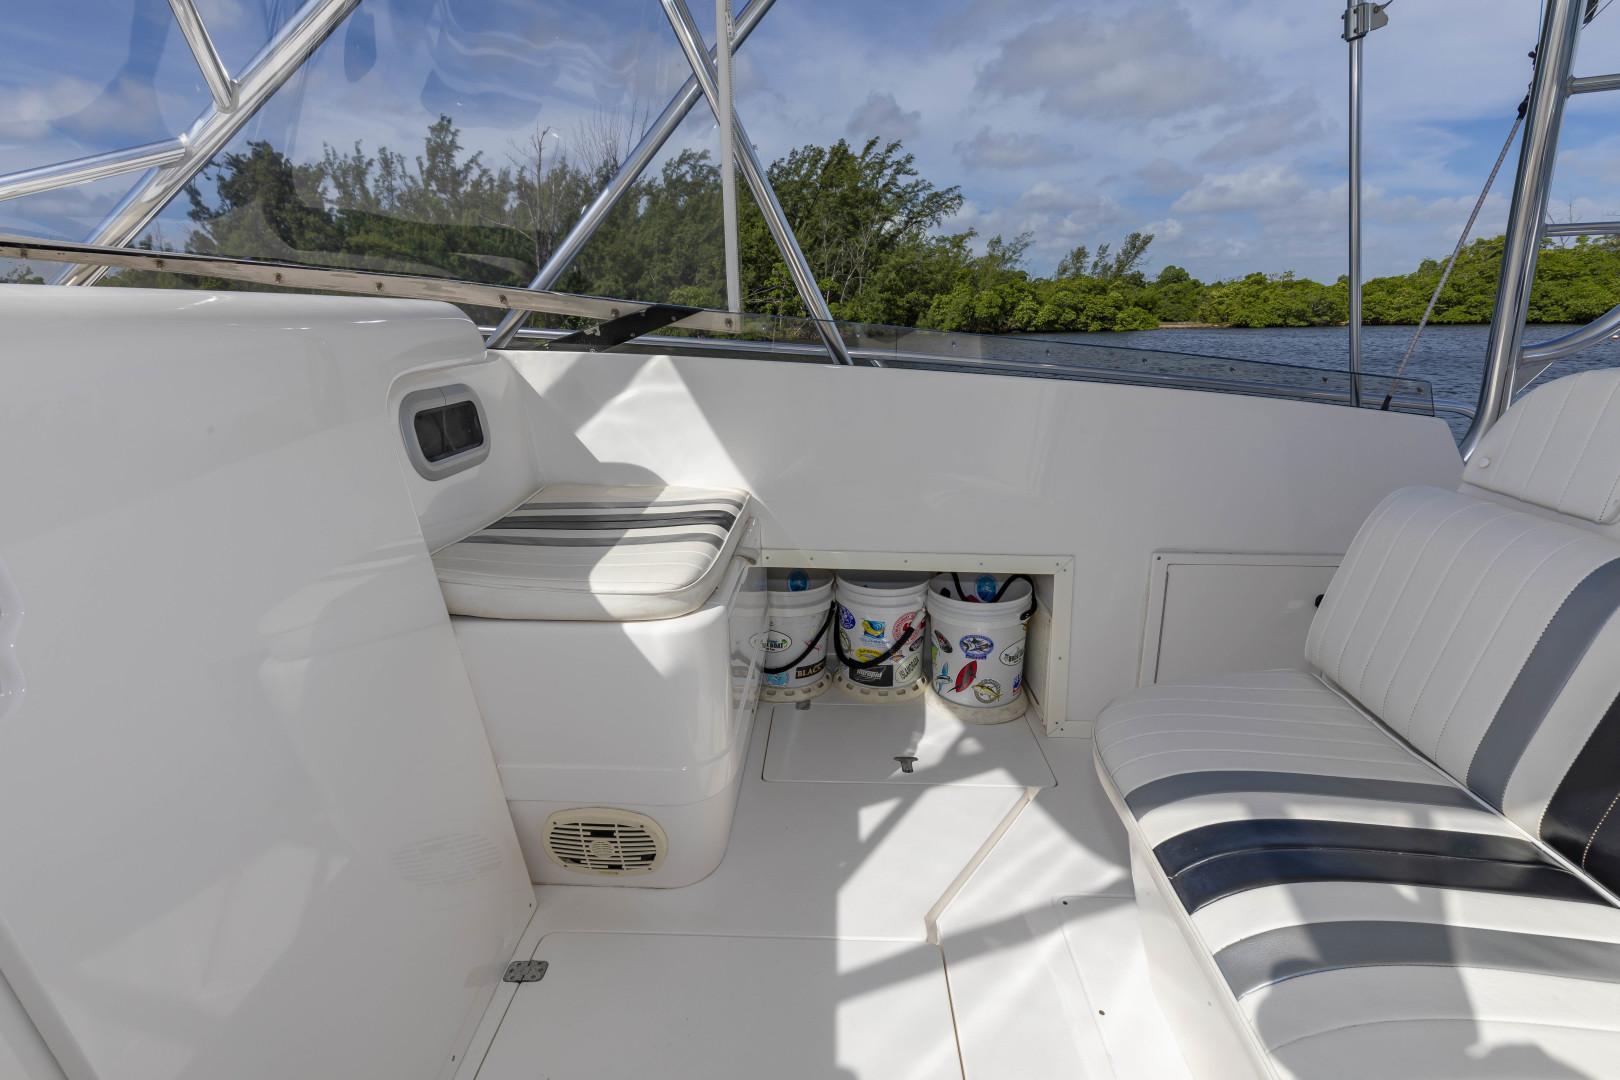 Intrepid-377 Walkaround 2005-Rock Boat REFIT 2018 Dania Beach-Florida-United States-377 Intrepid Helm 3-1511546 | Thumbnail